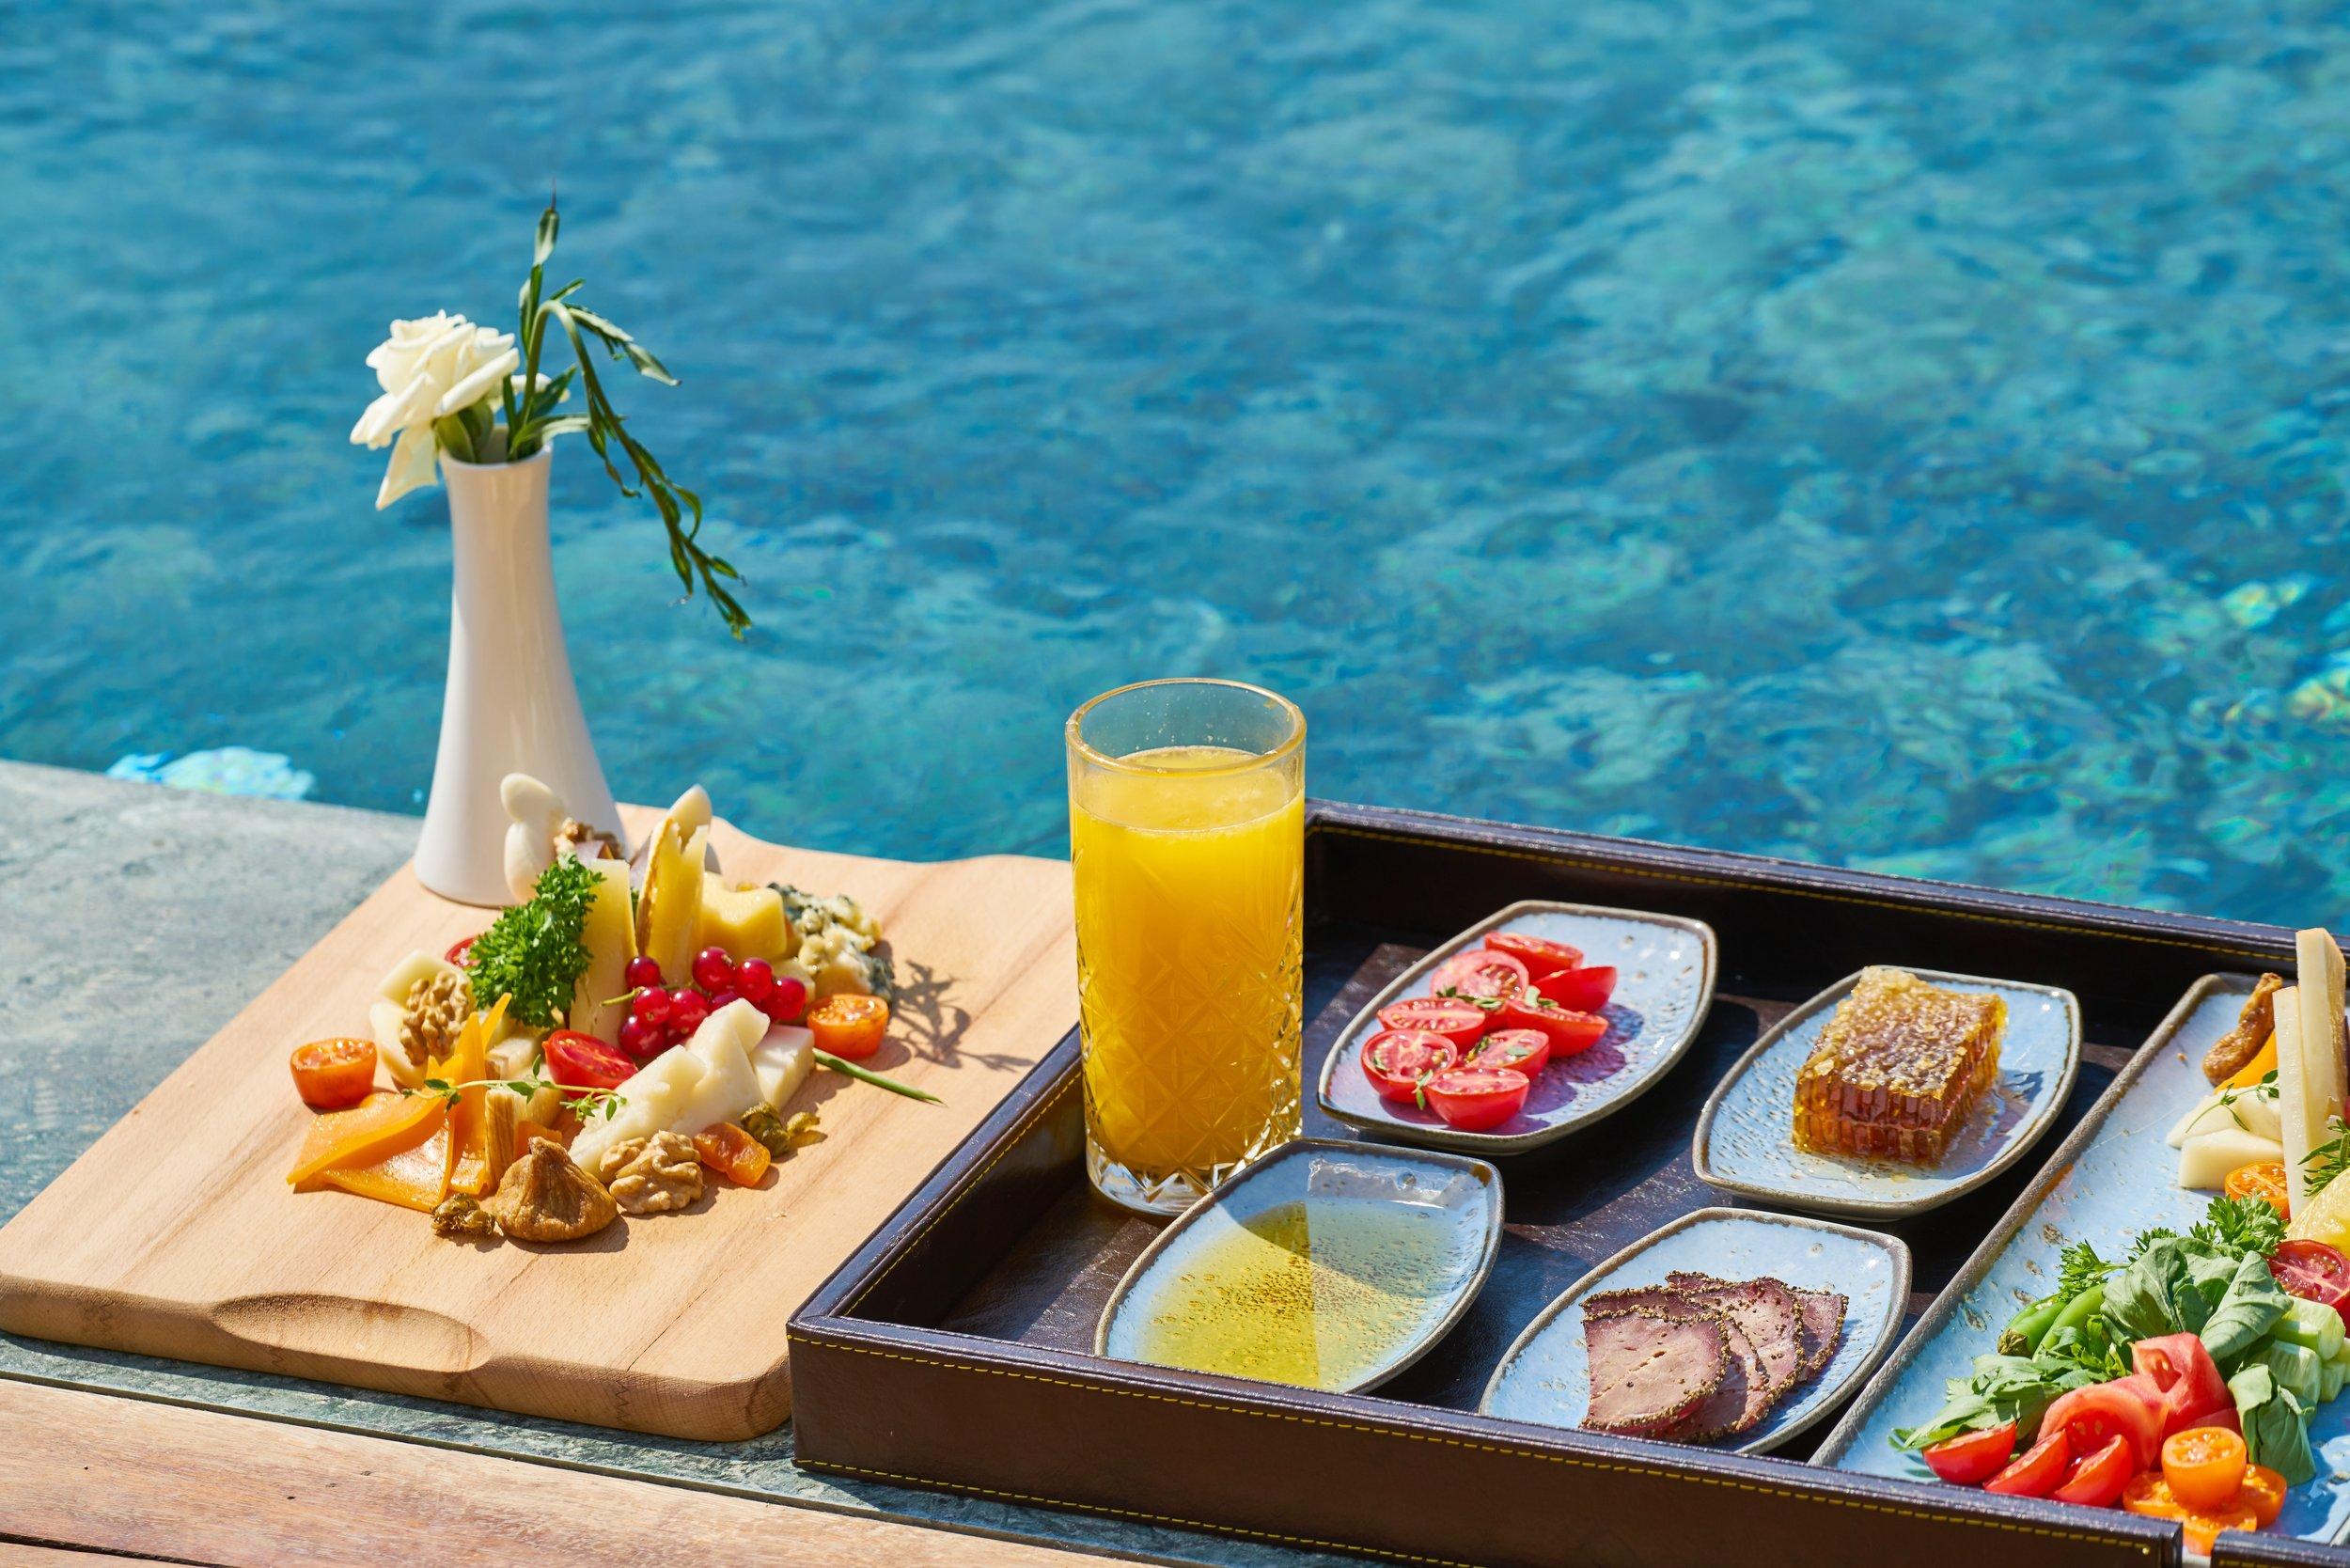 assortment-breakfast-cuisine-2736387.jpg